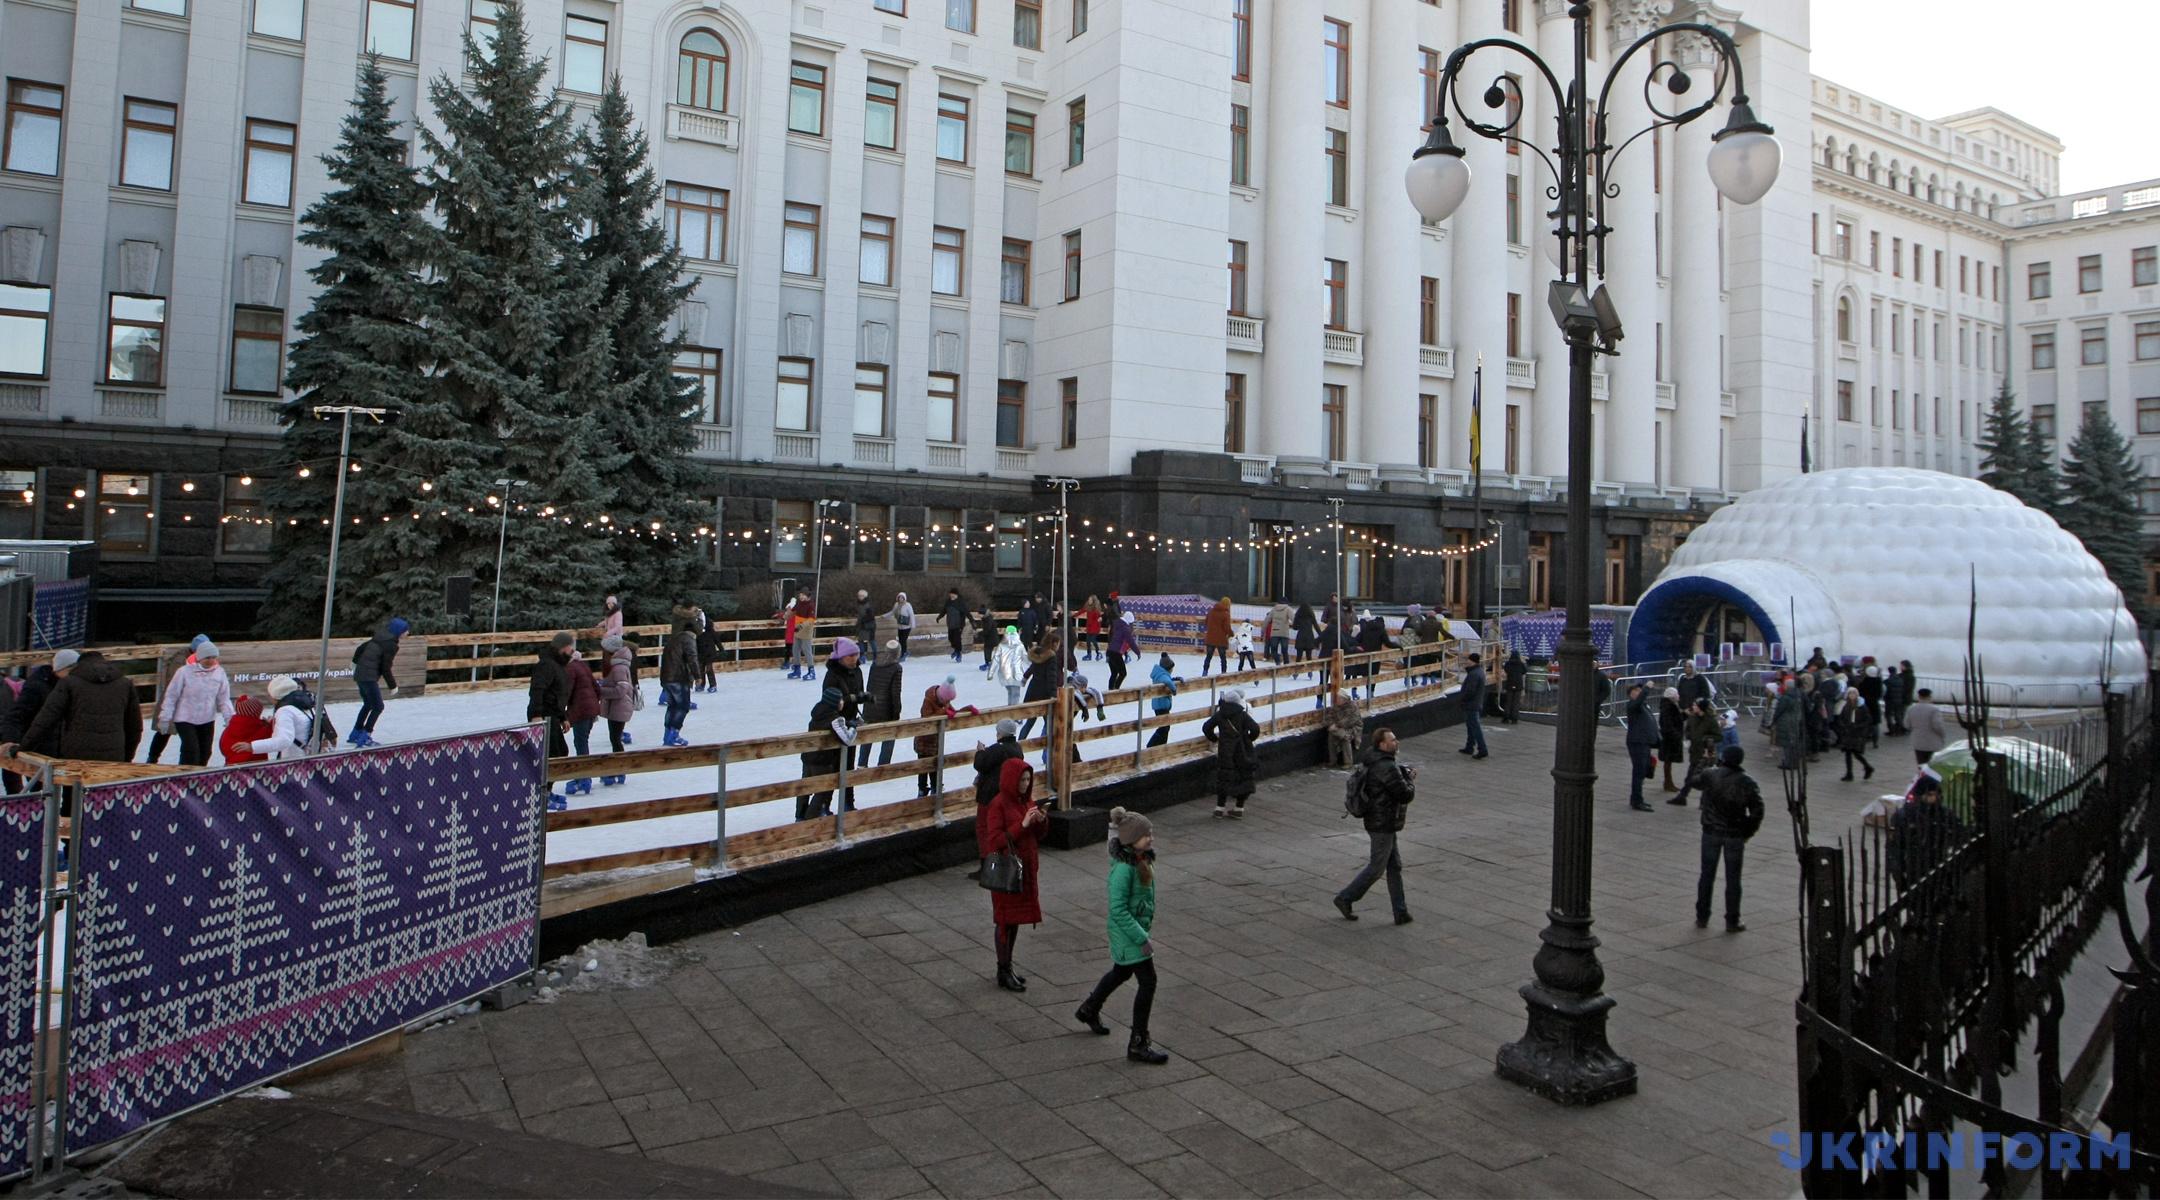 https://static.ukrinform.com/photos/2020_01/1579629540-938.jpg?0.3248055633433249